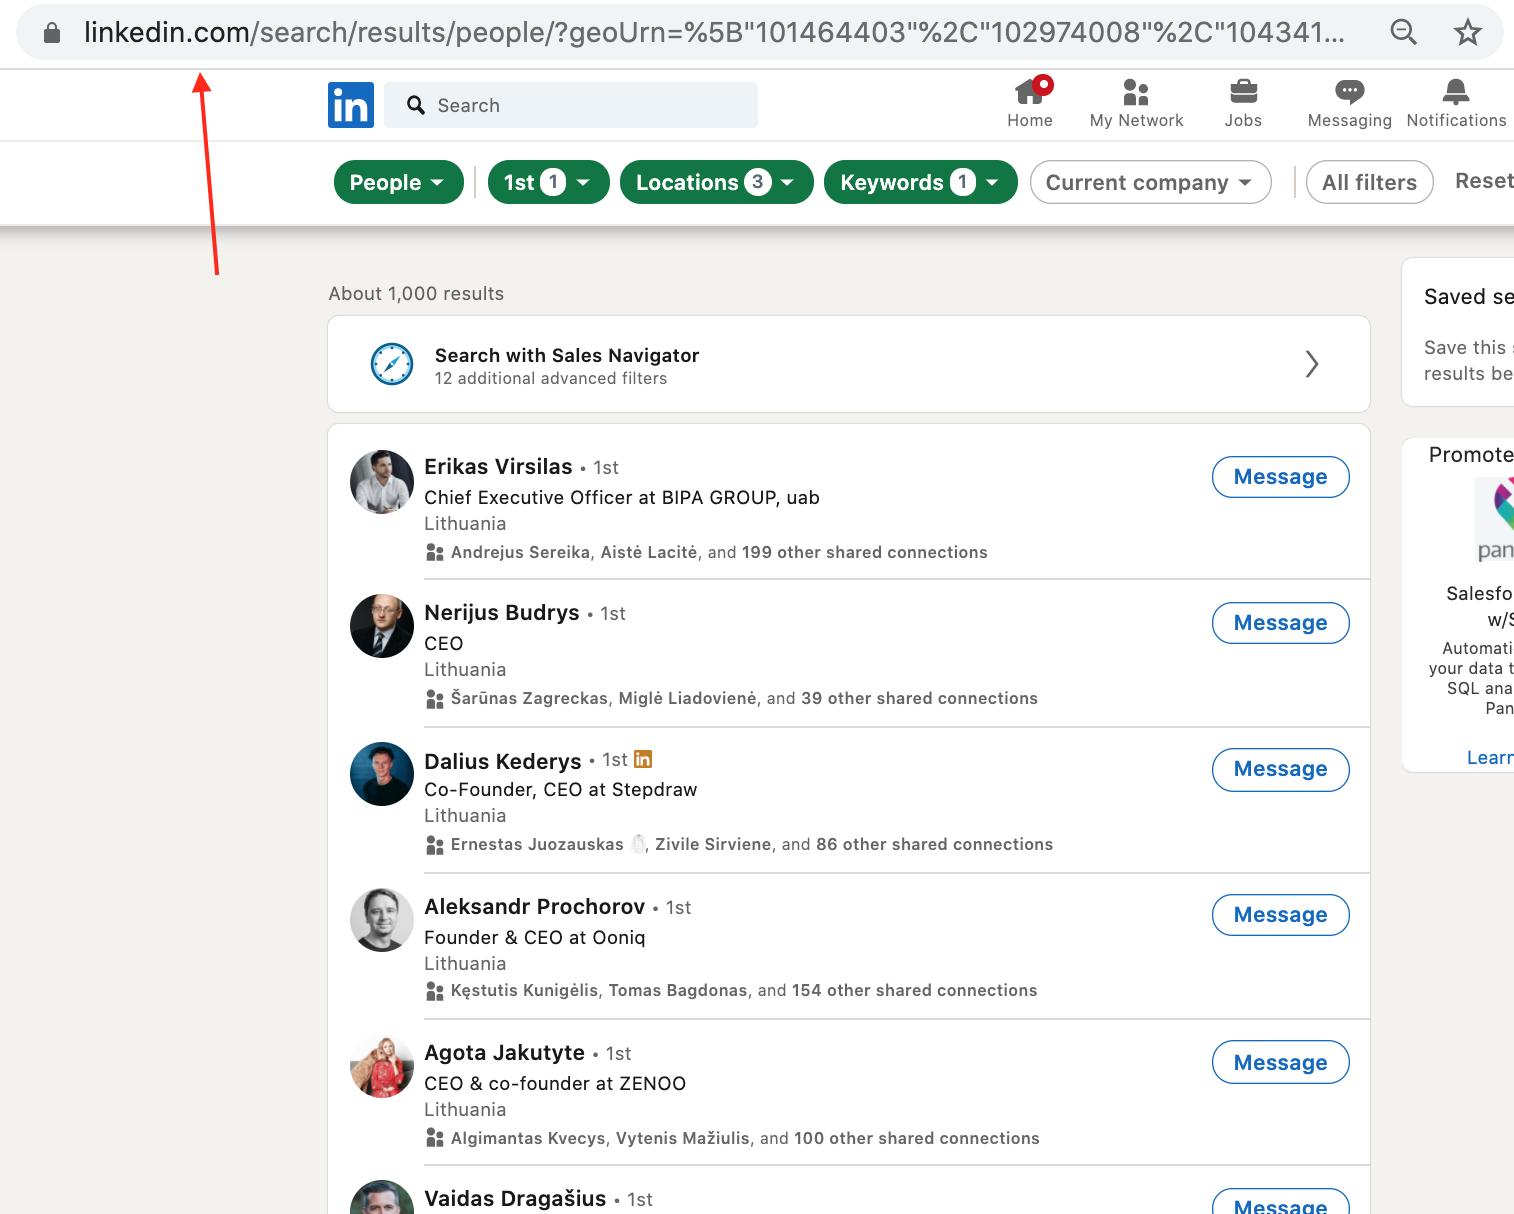 LinkedIn 1st Degree search